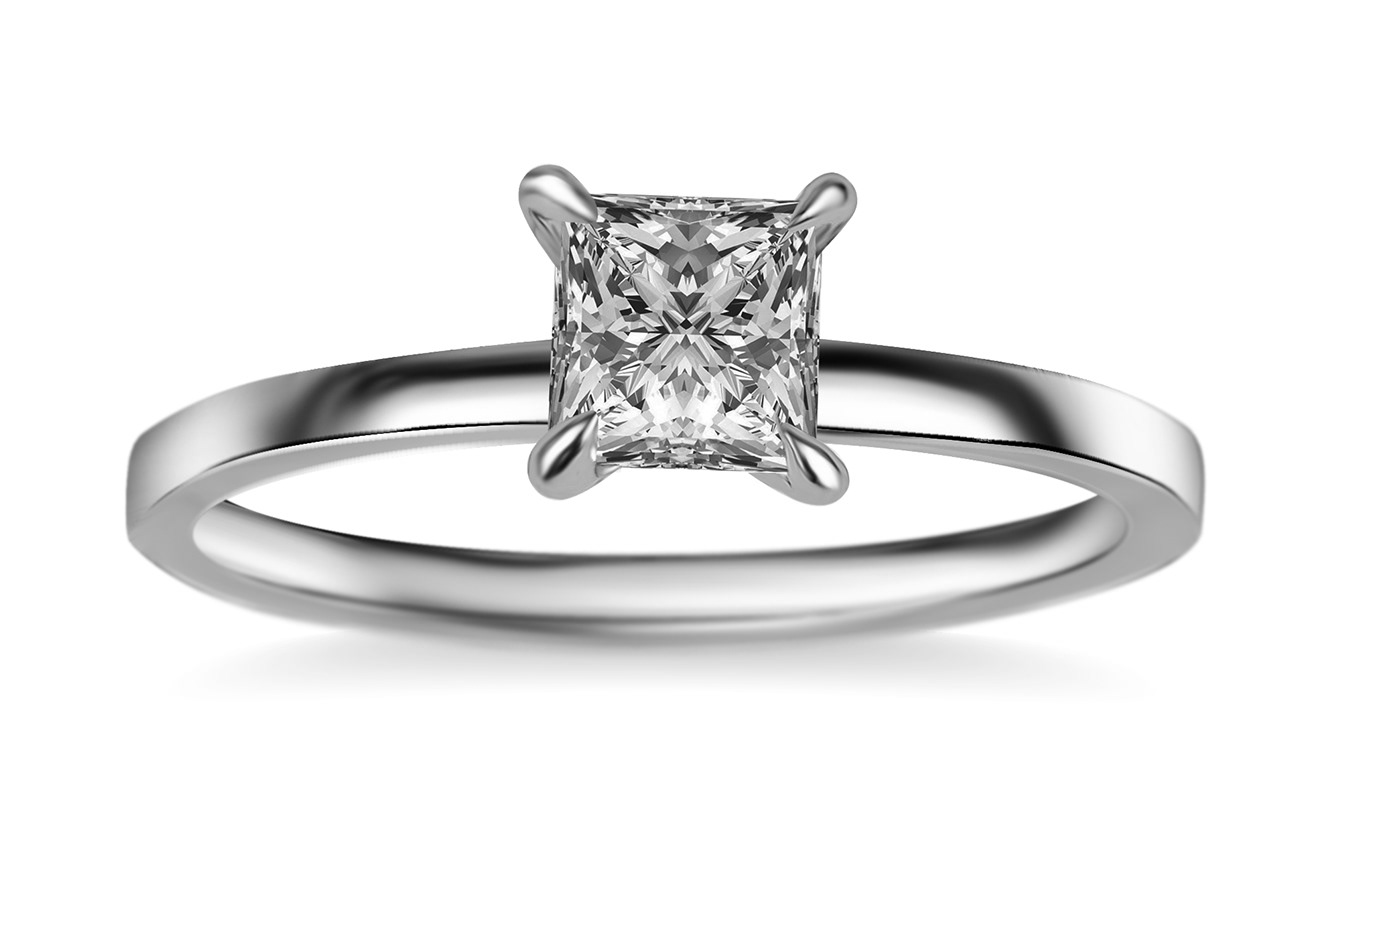 diamond photography hiend retouch Jewellery Jewelry Photography